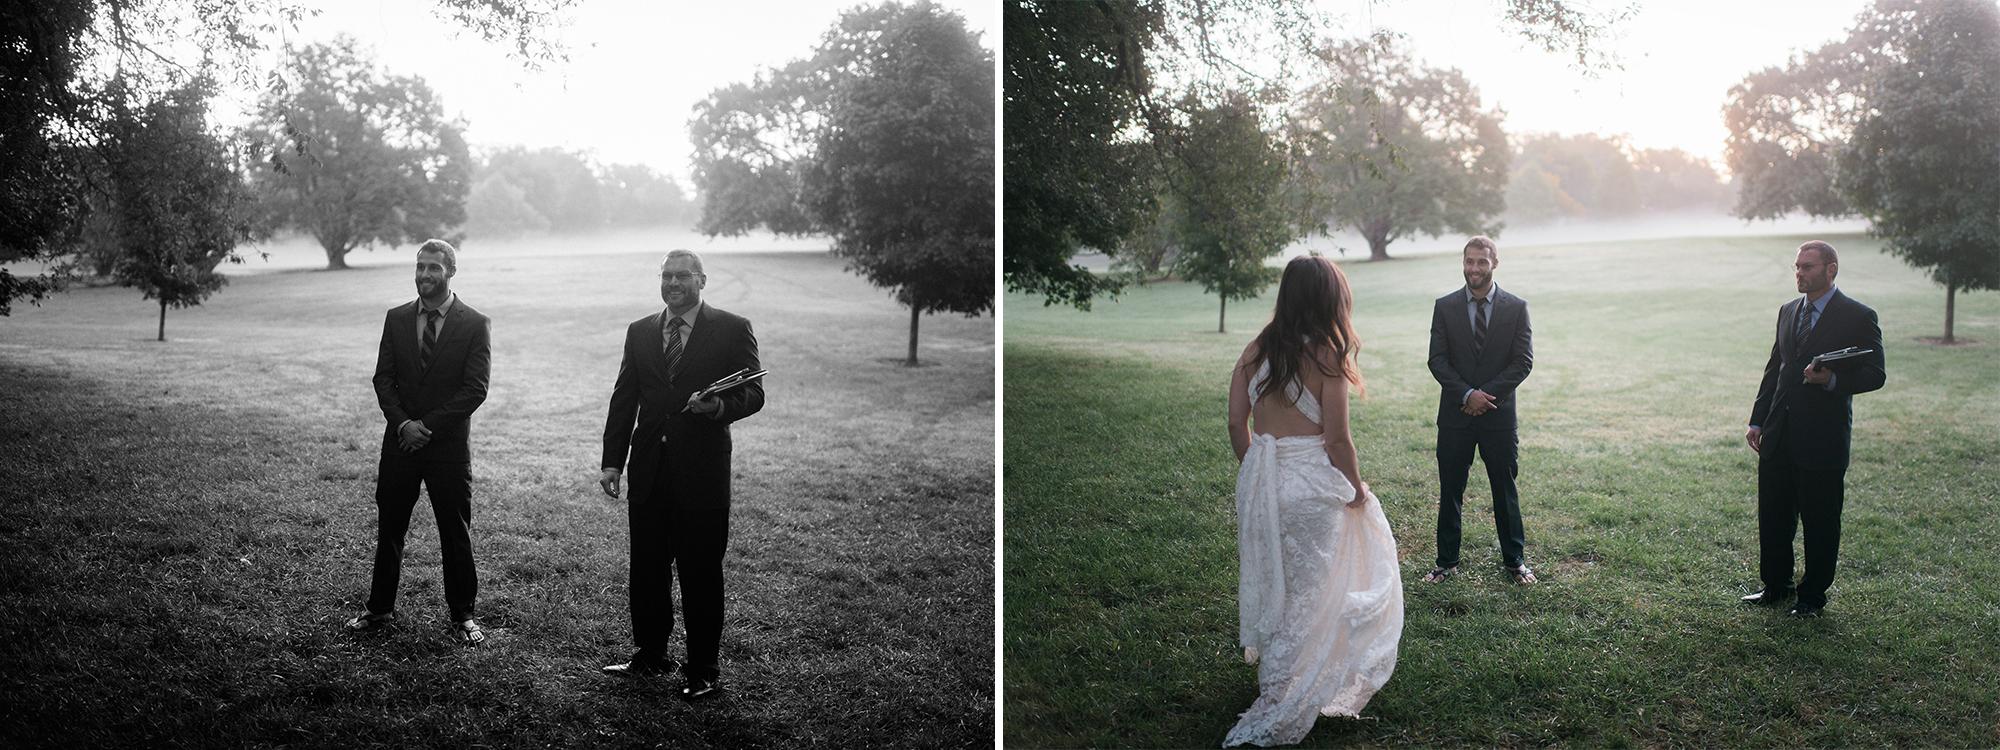 Kansas_City_Wedding_Elopement_Photographer_Loose_Park_4.jpg